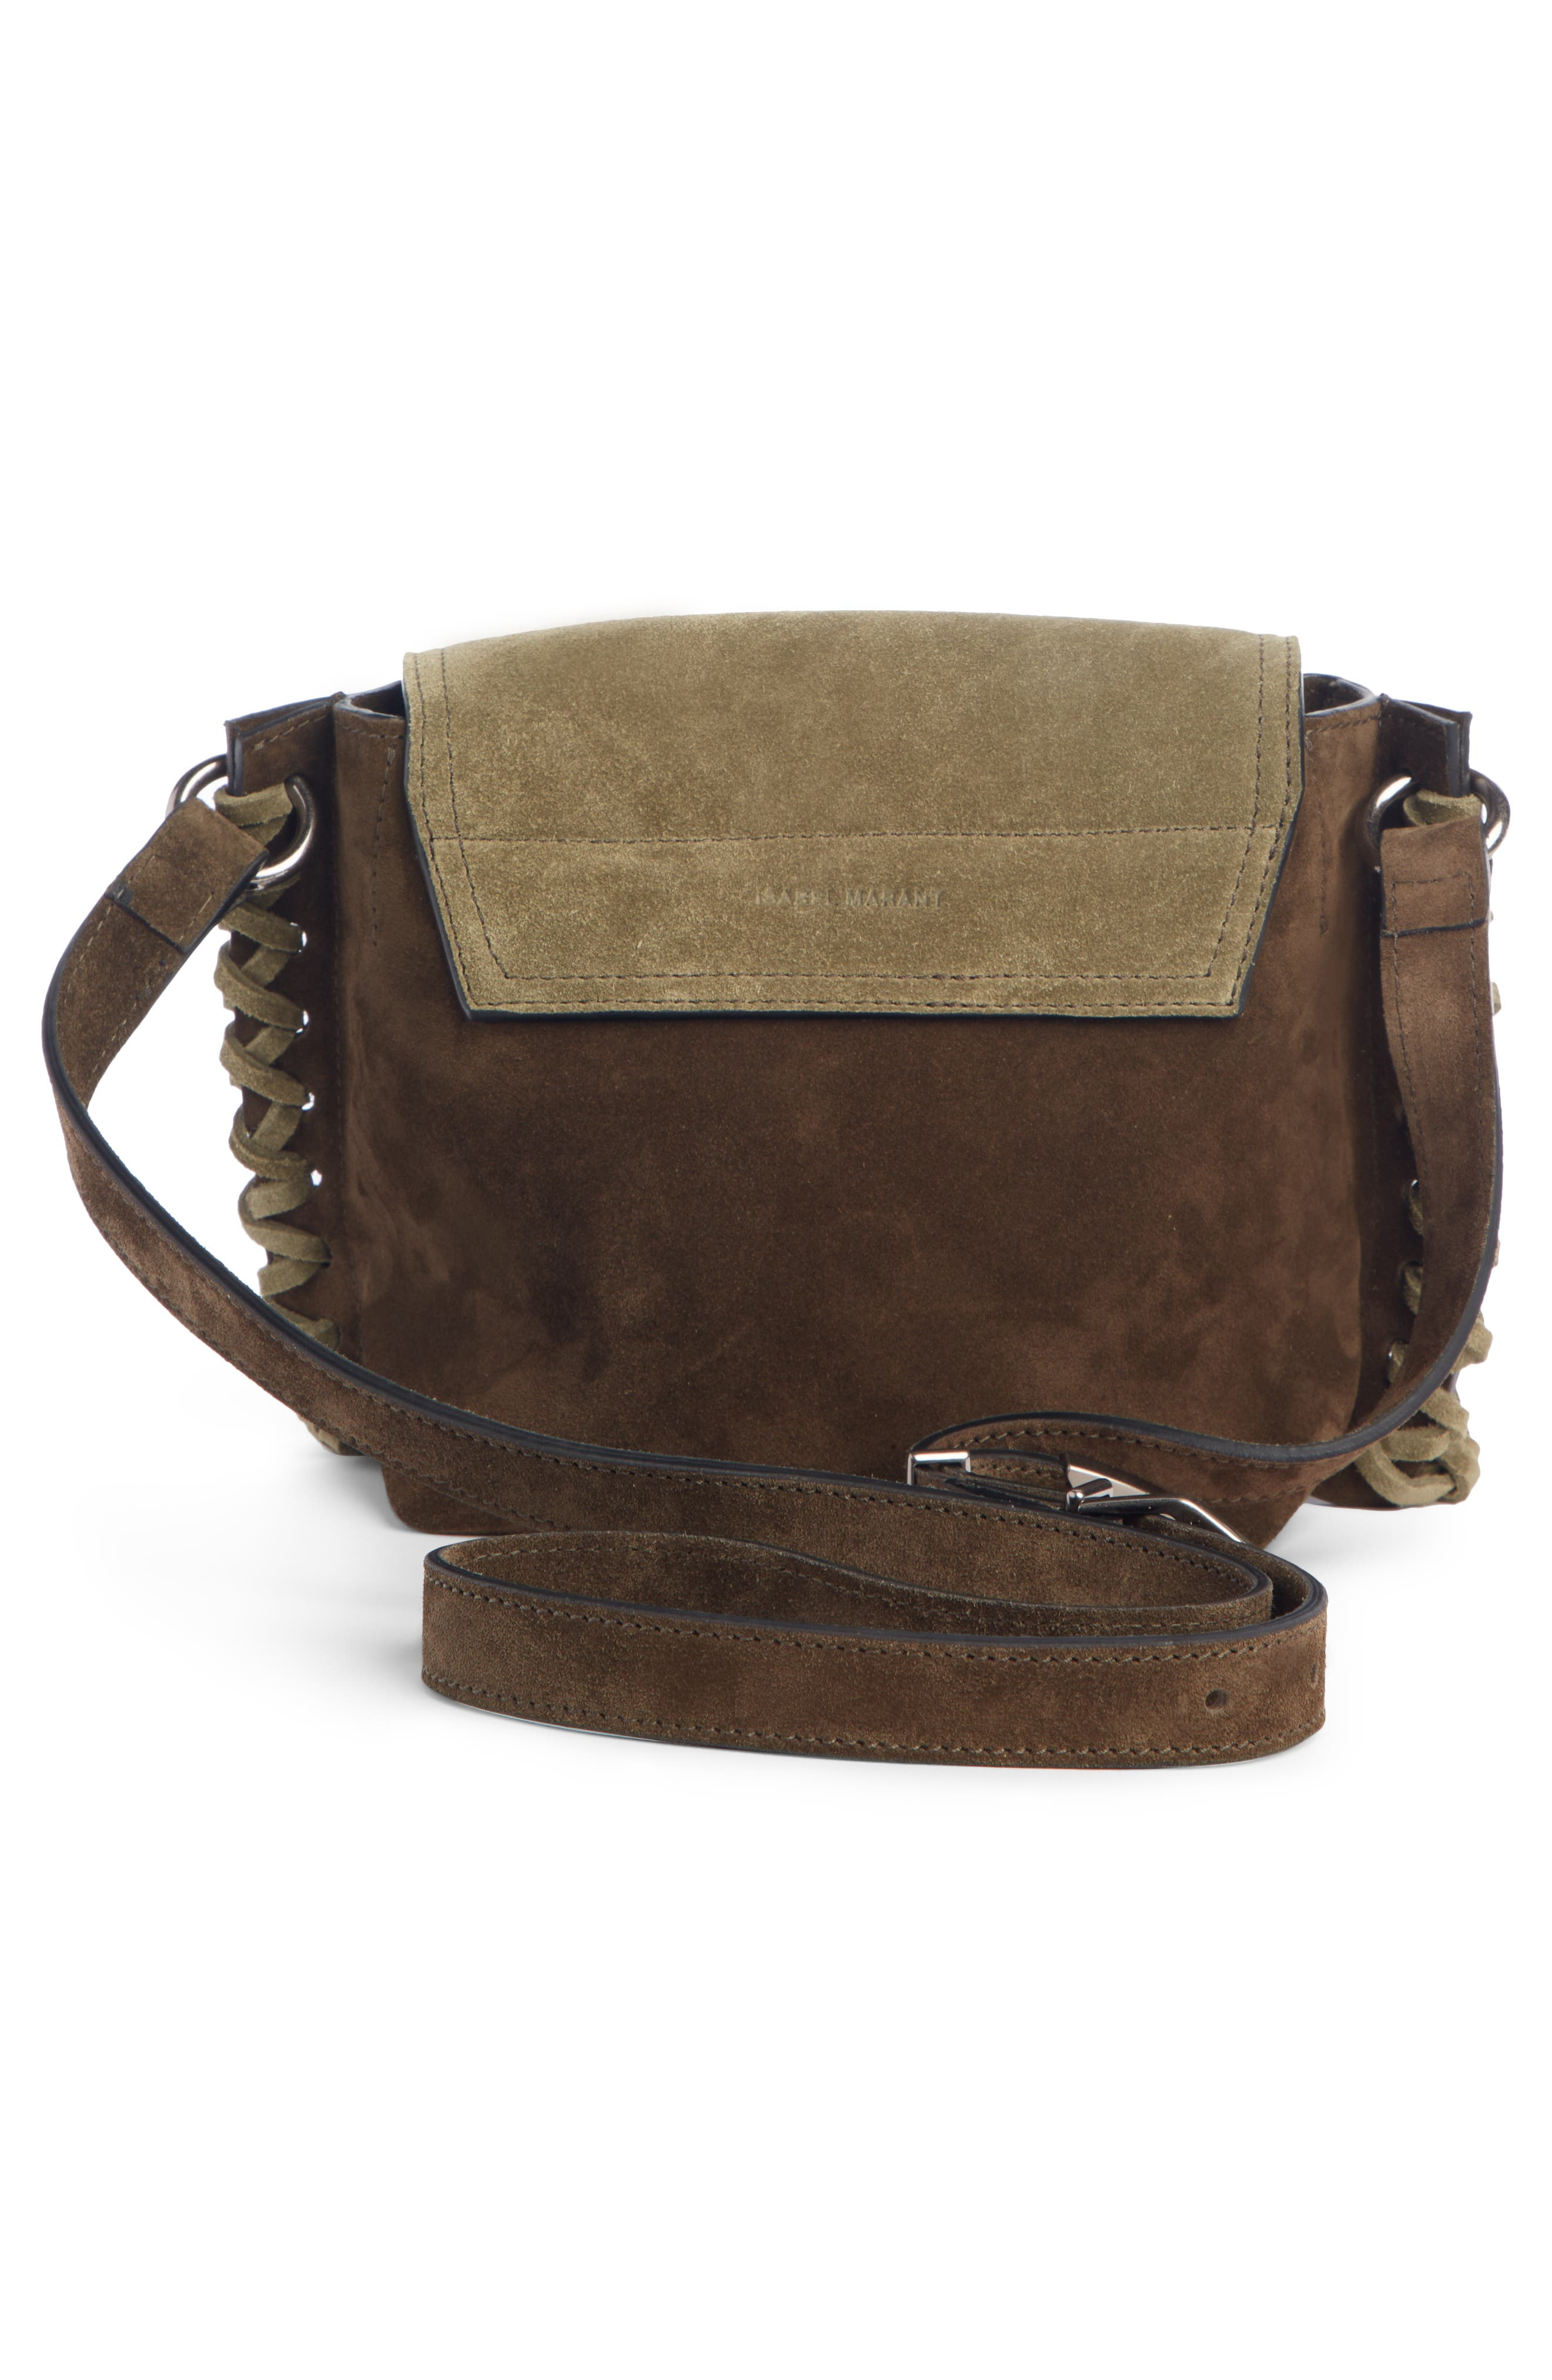 ISABEL MARANT,                             Kleny Colorblock Suede Shoulder Bag,                             Alternate thumbnail 3, color,                             KHAKI